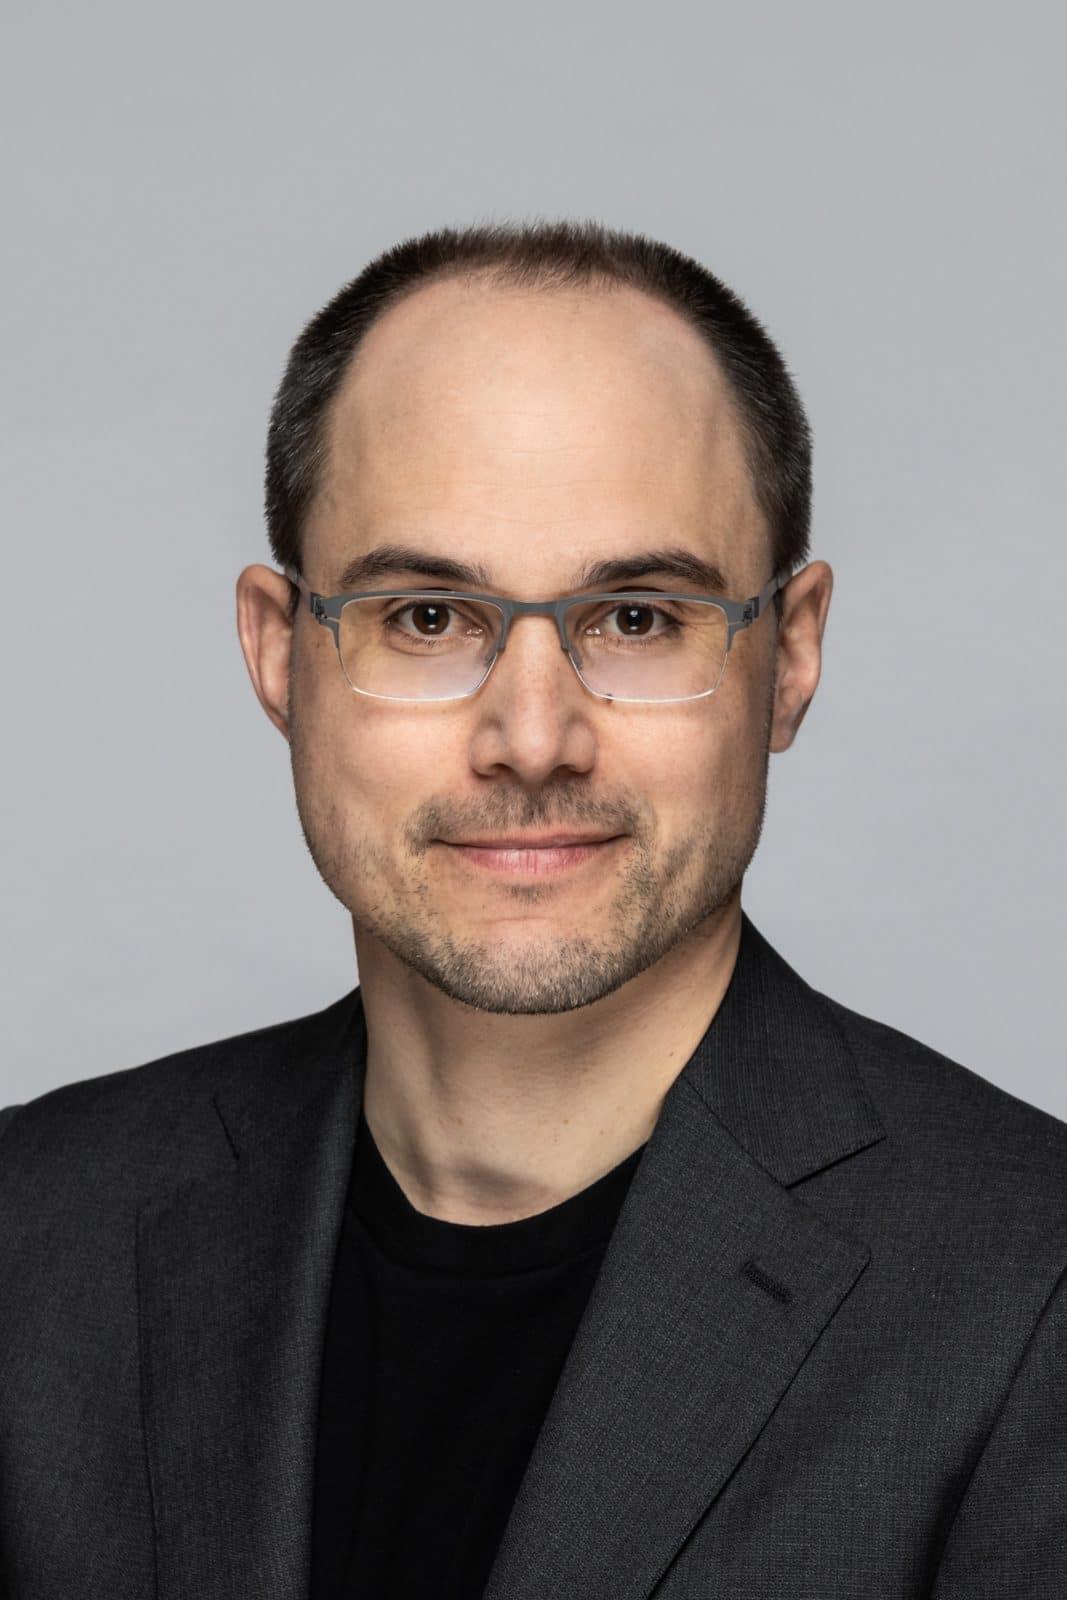 Dr. Jochen Scheuer